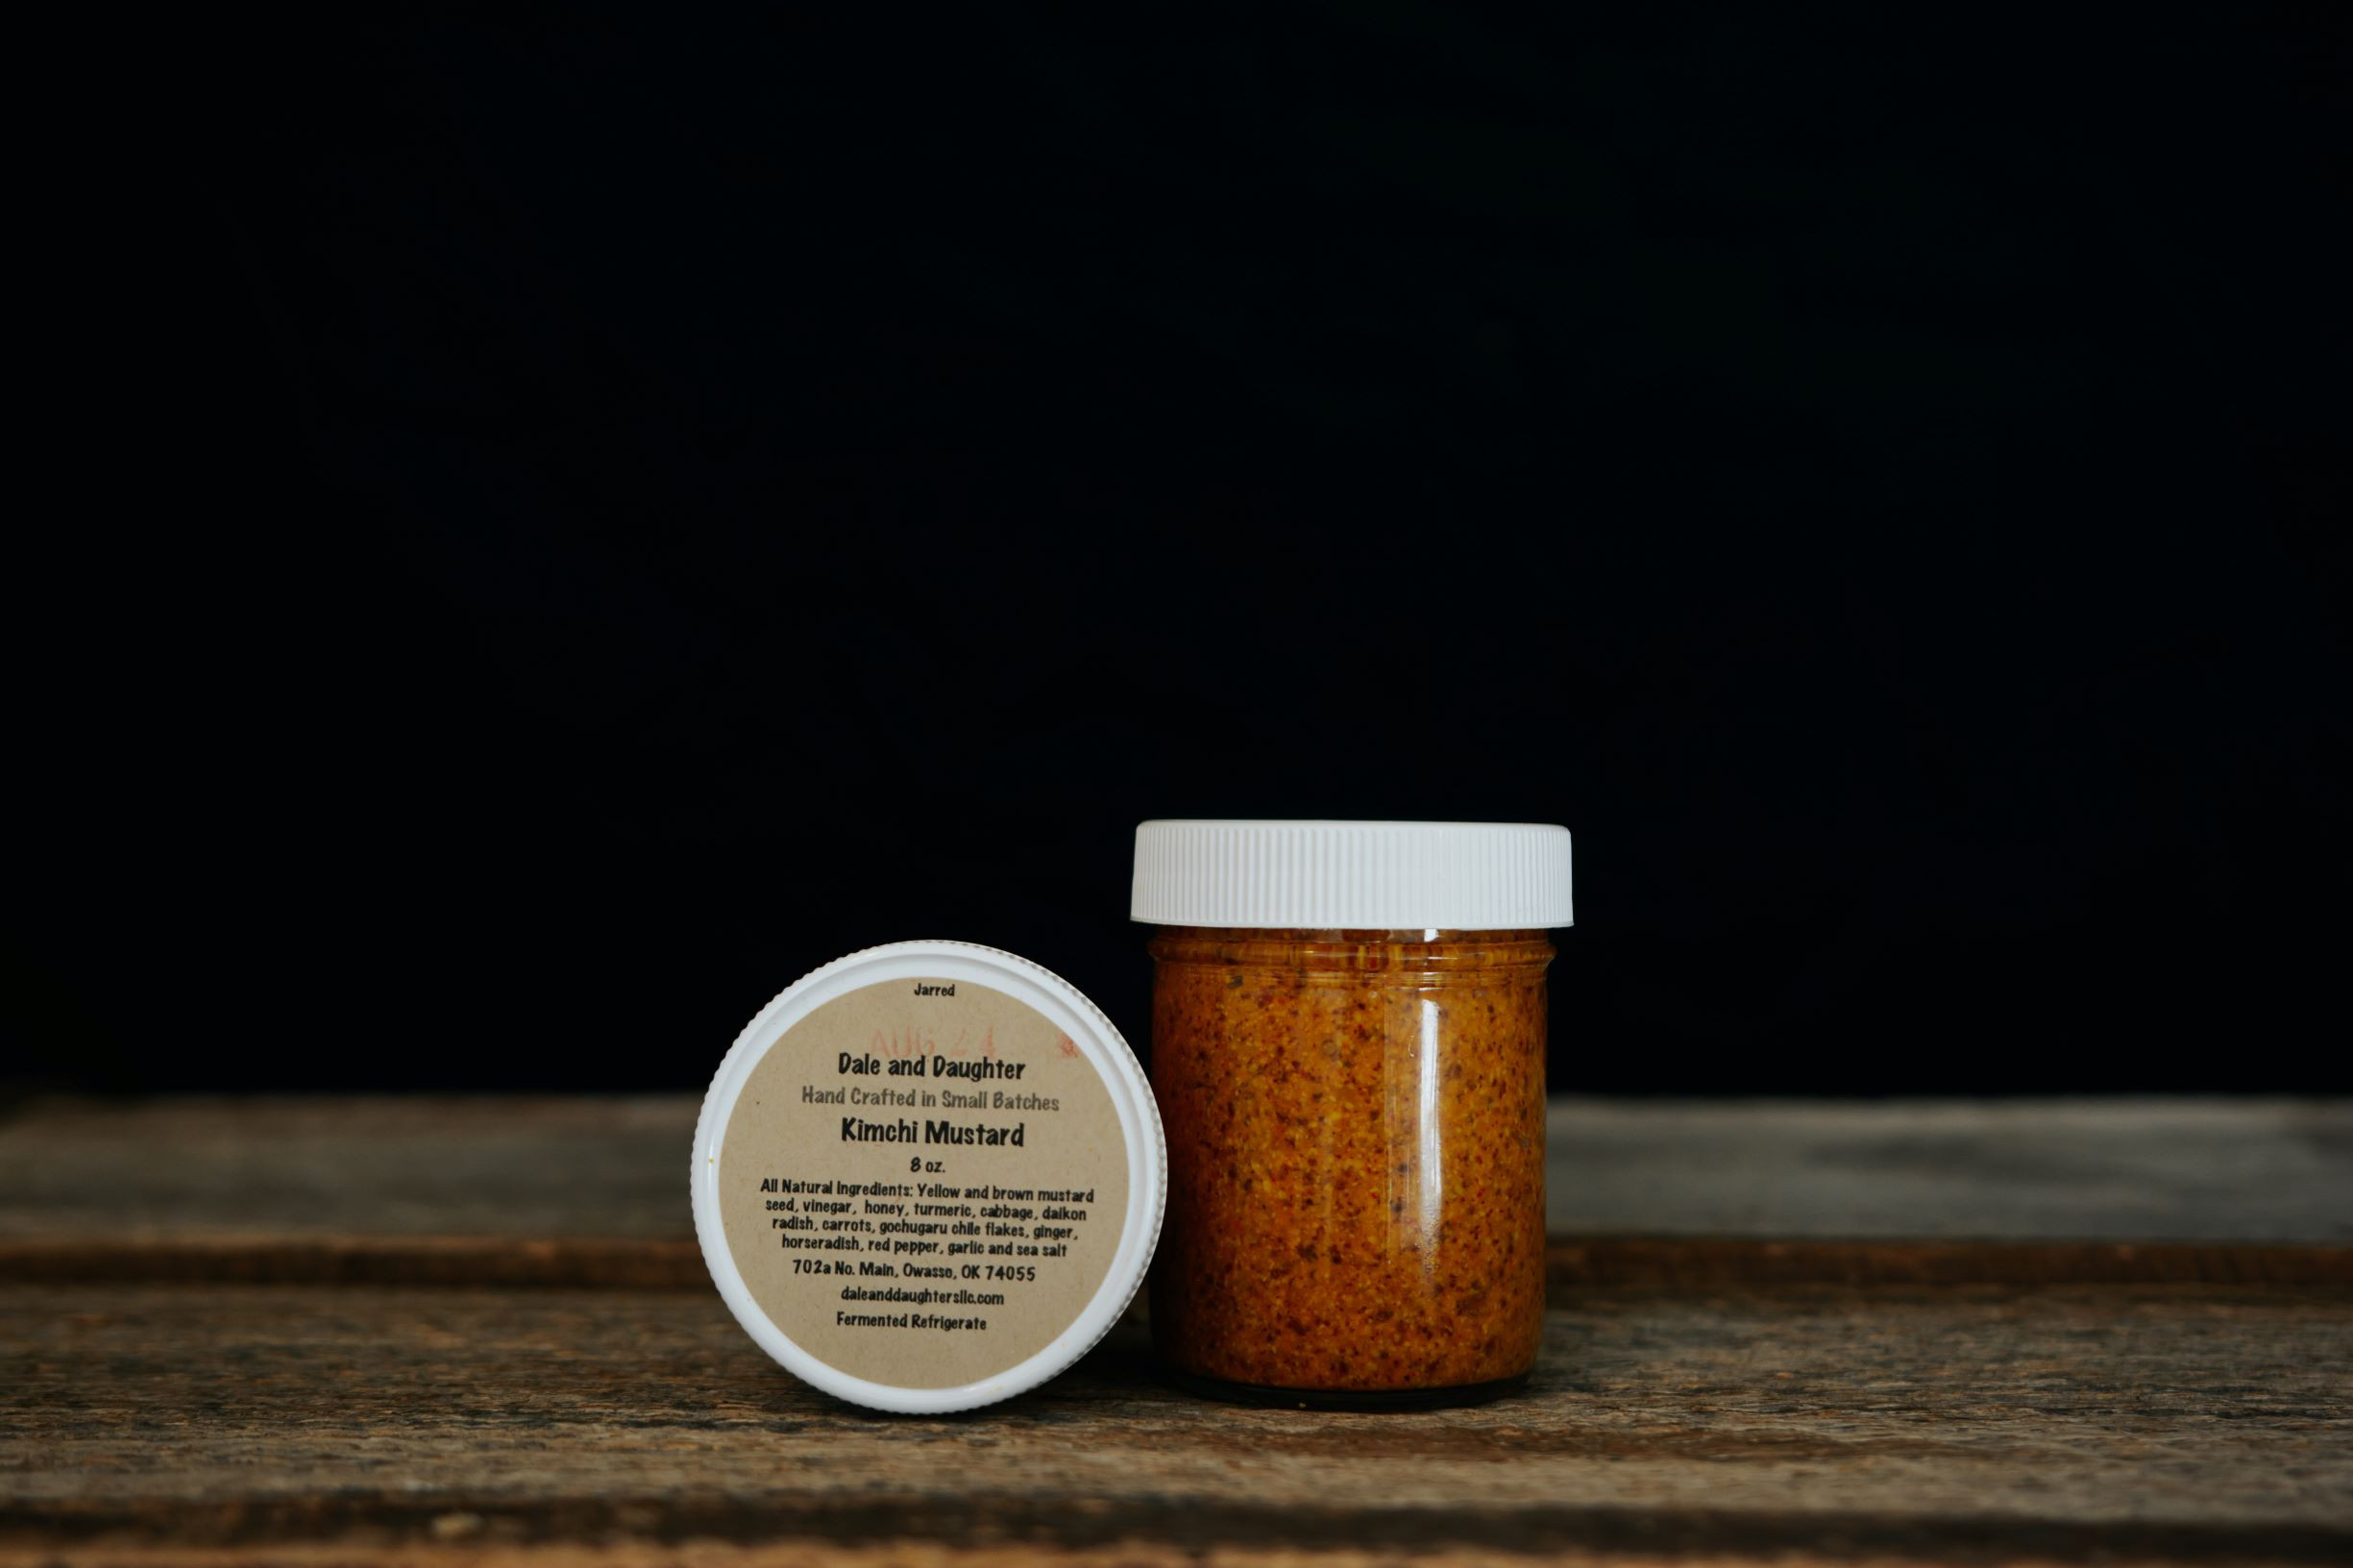 Kimchi Mustard